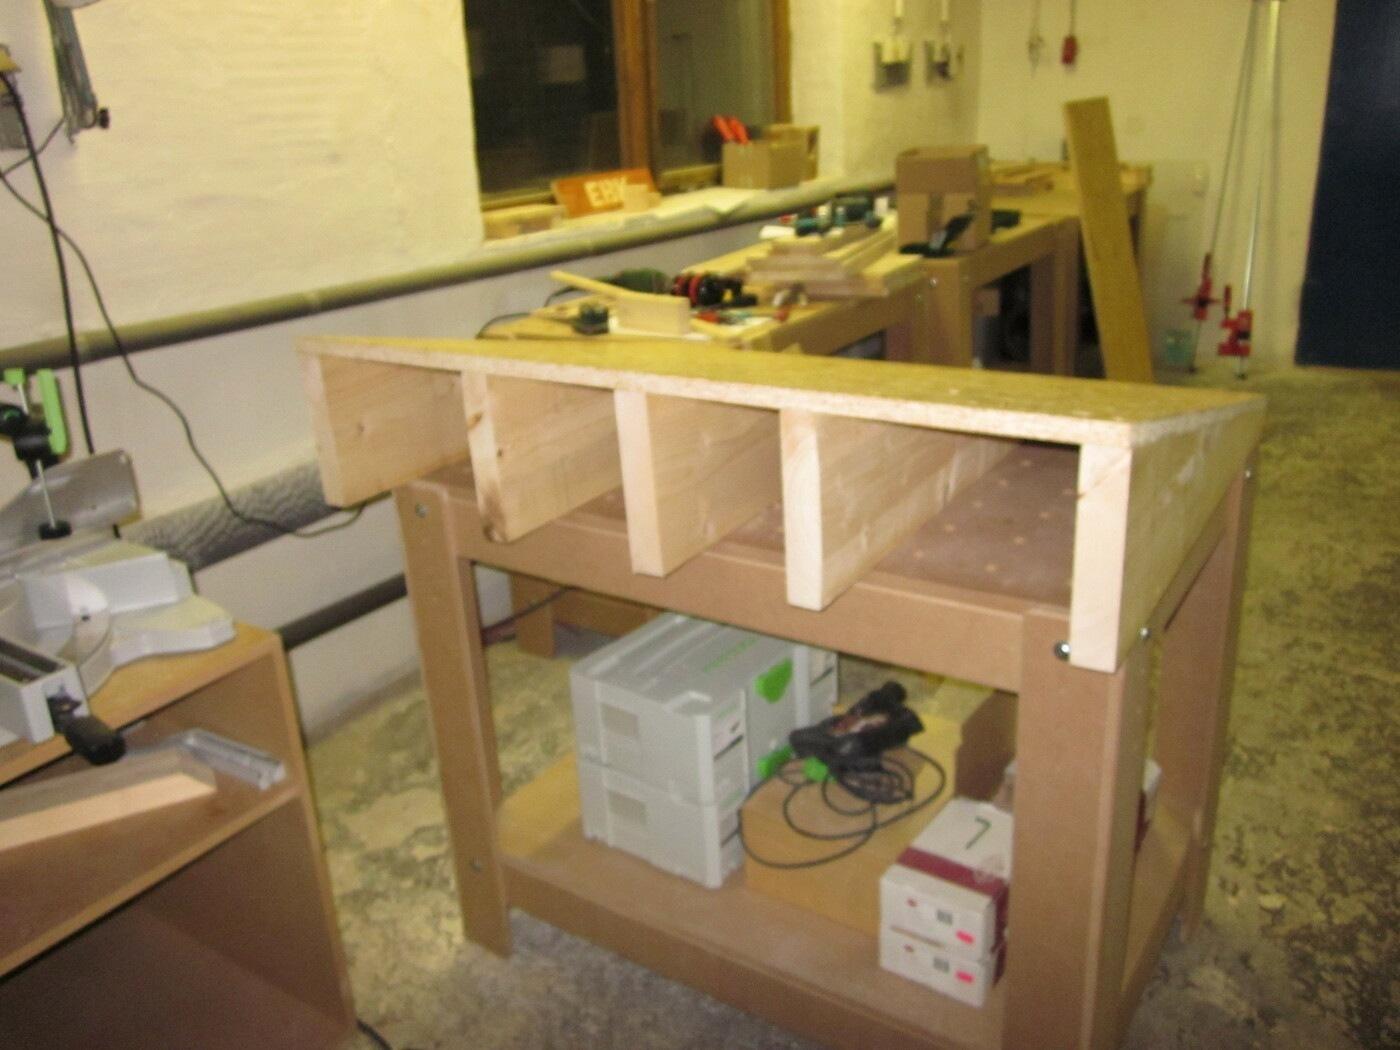 klettertrainingsboard eigenbaukombinat. Black Bedroom Furniture Sets. Home Design Ideas